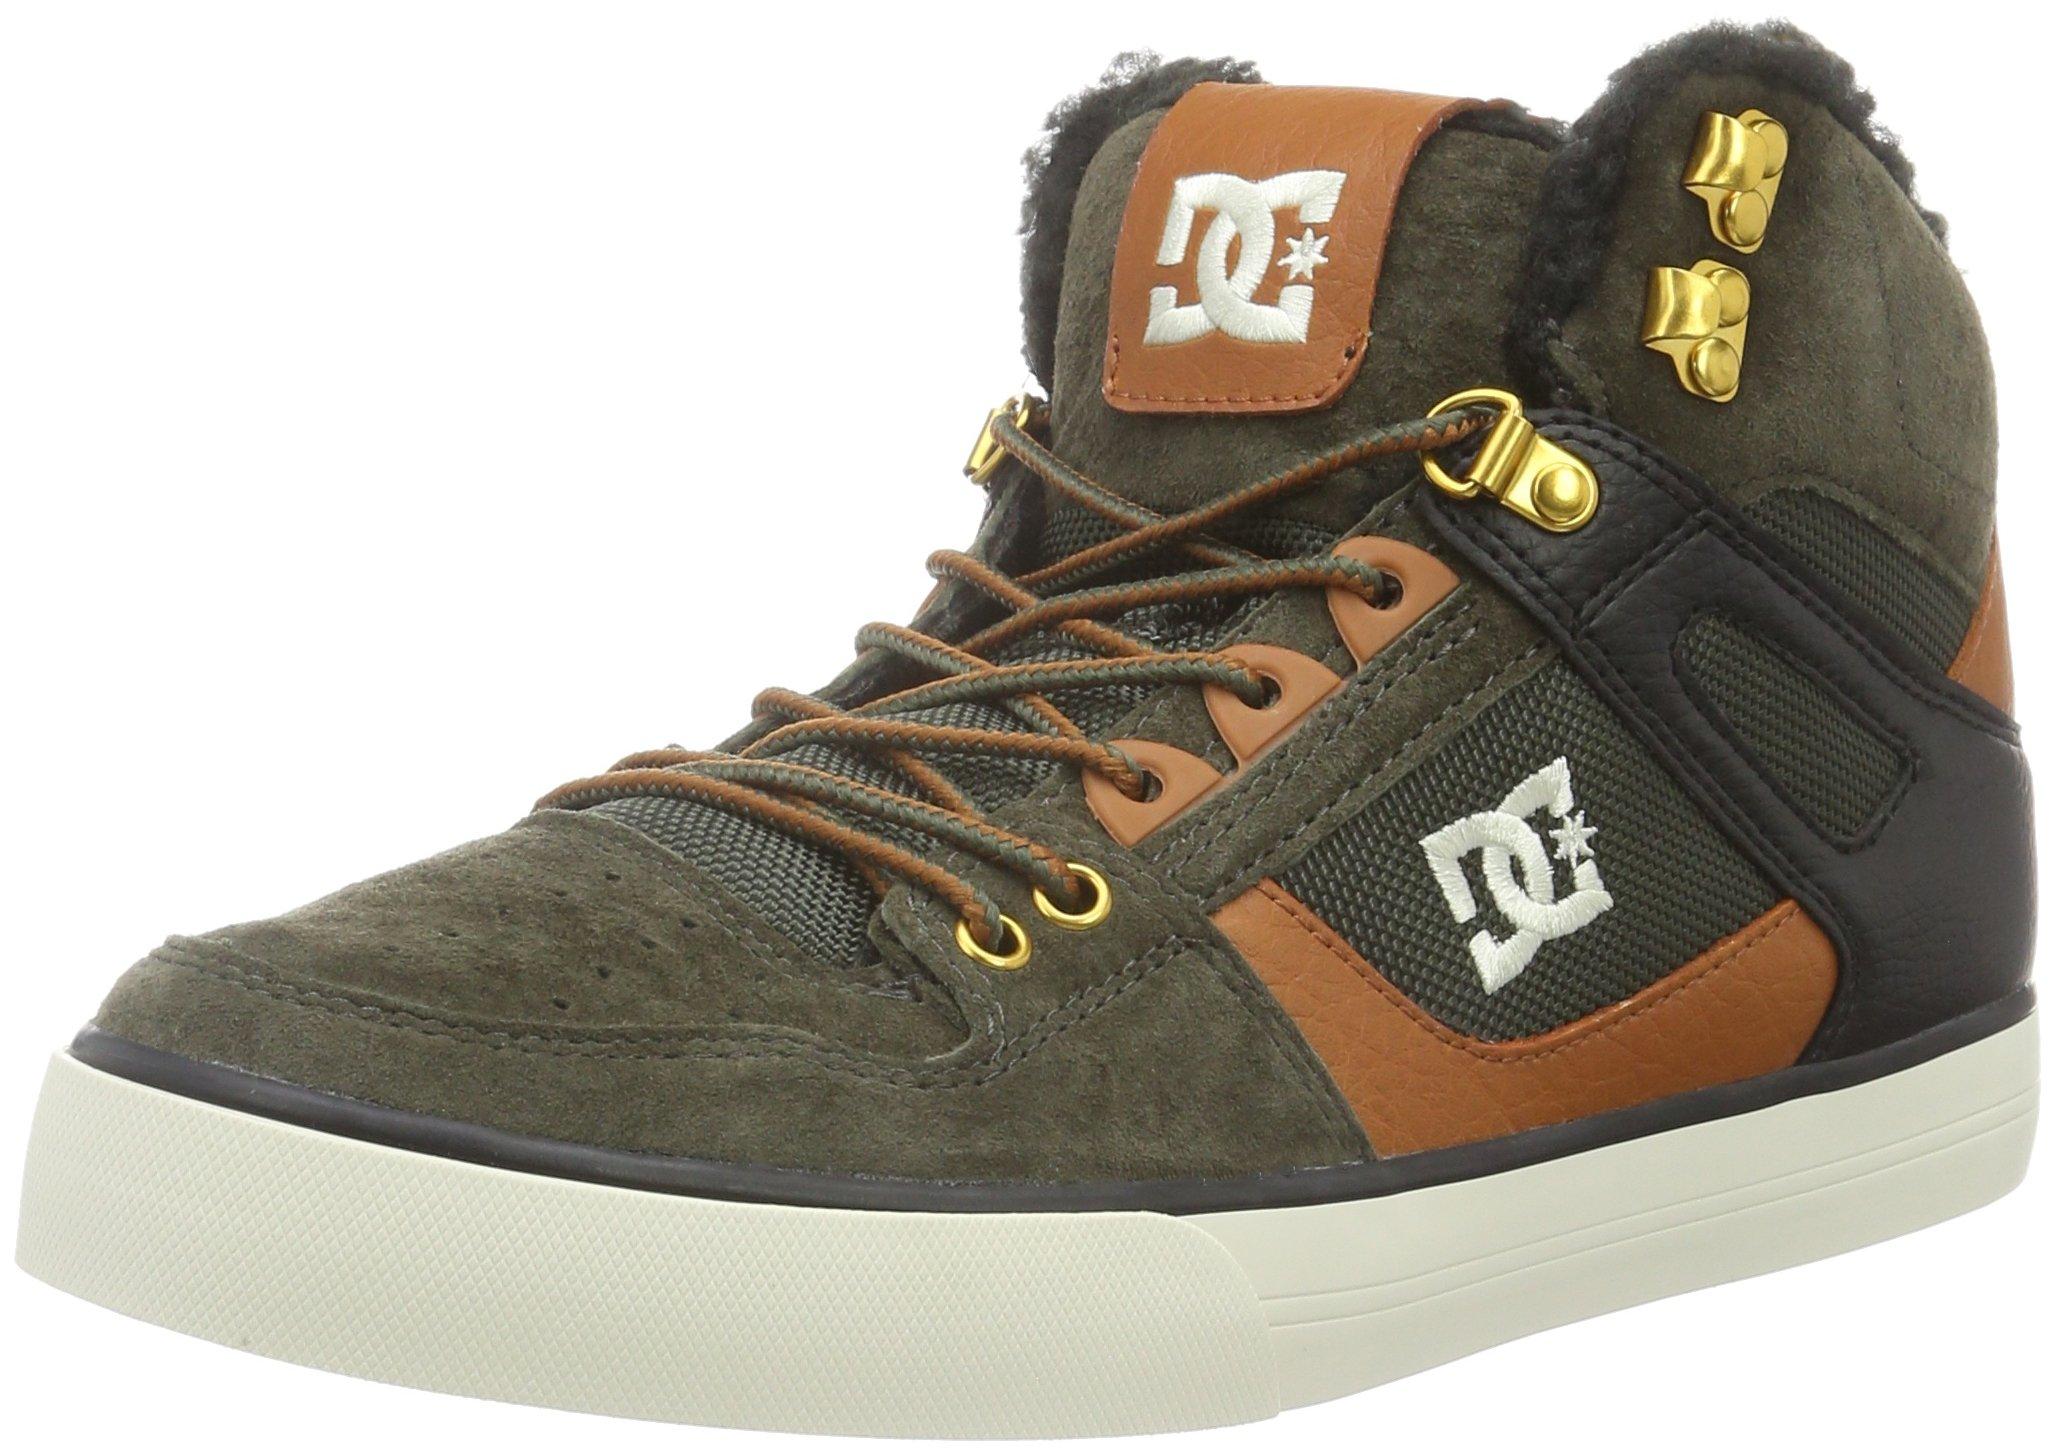 WntBaskets Basses Eu Dc HommeVertmilitary Shoes Spartan Wc mil42 dorCxBe